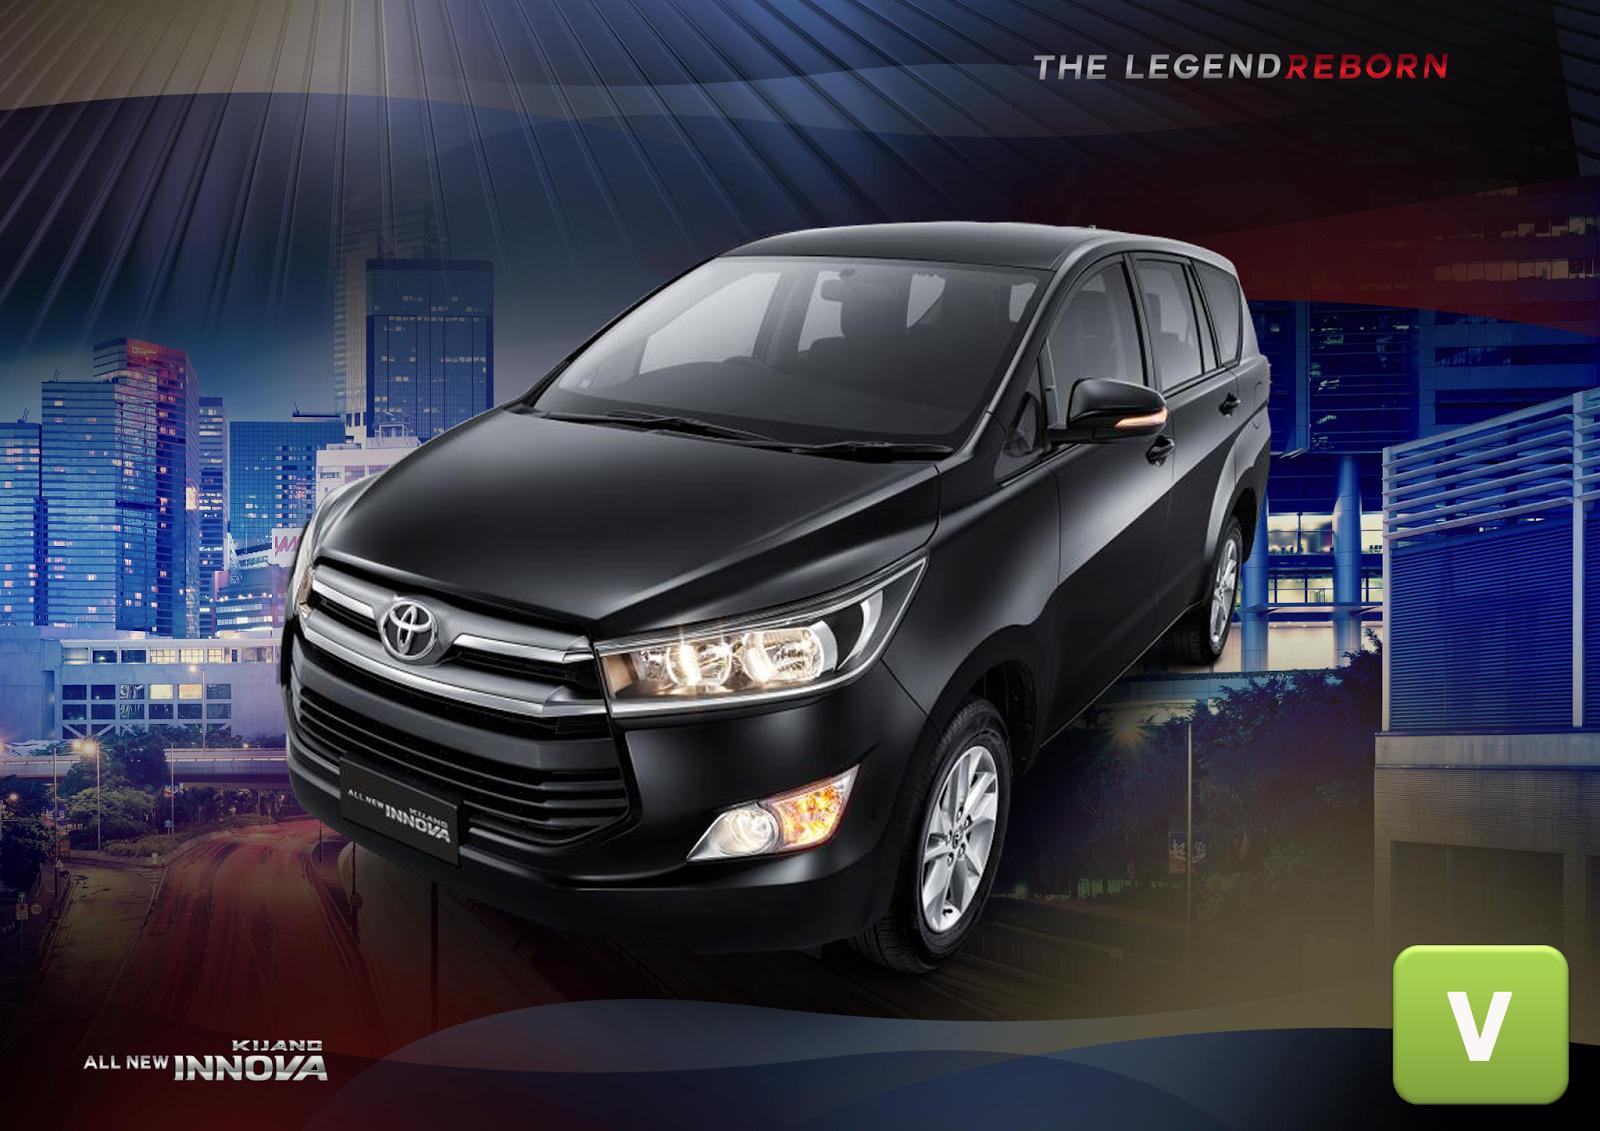 all new kijang innova the legend reborn indikator grand avanza eksterior toyota facelift 2015 astra tipe g